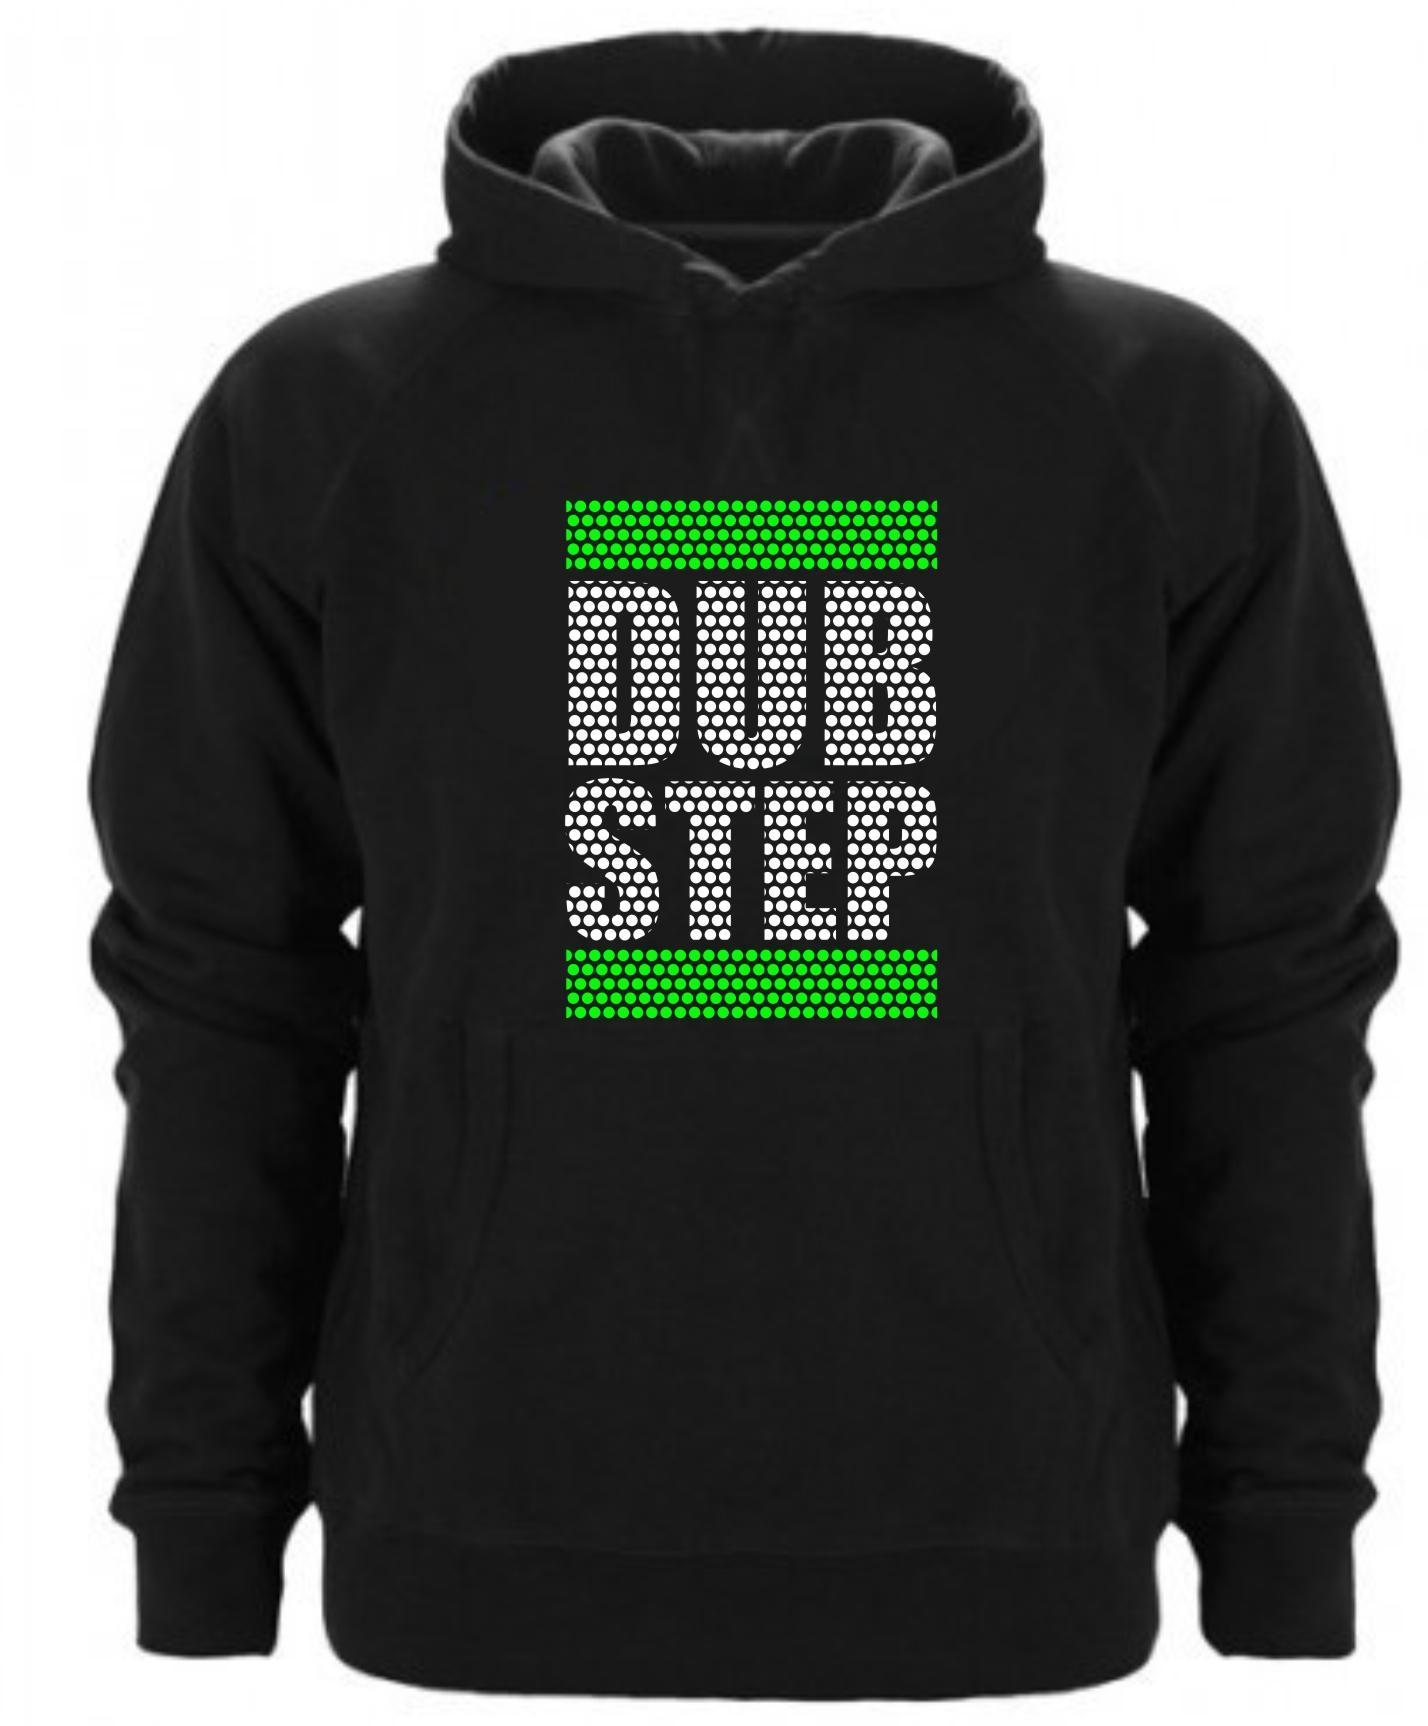 SUDADERA CAPUCHA DUB STEP